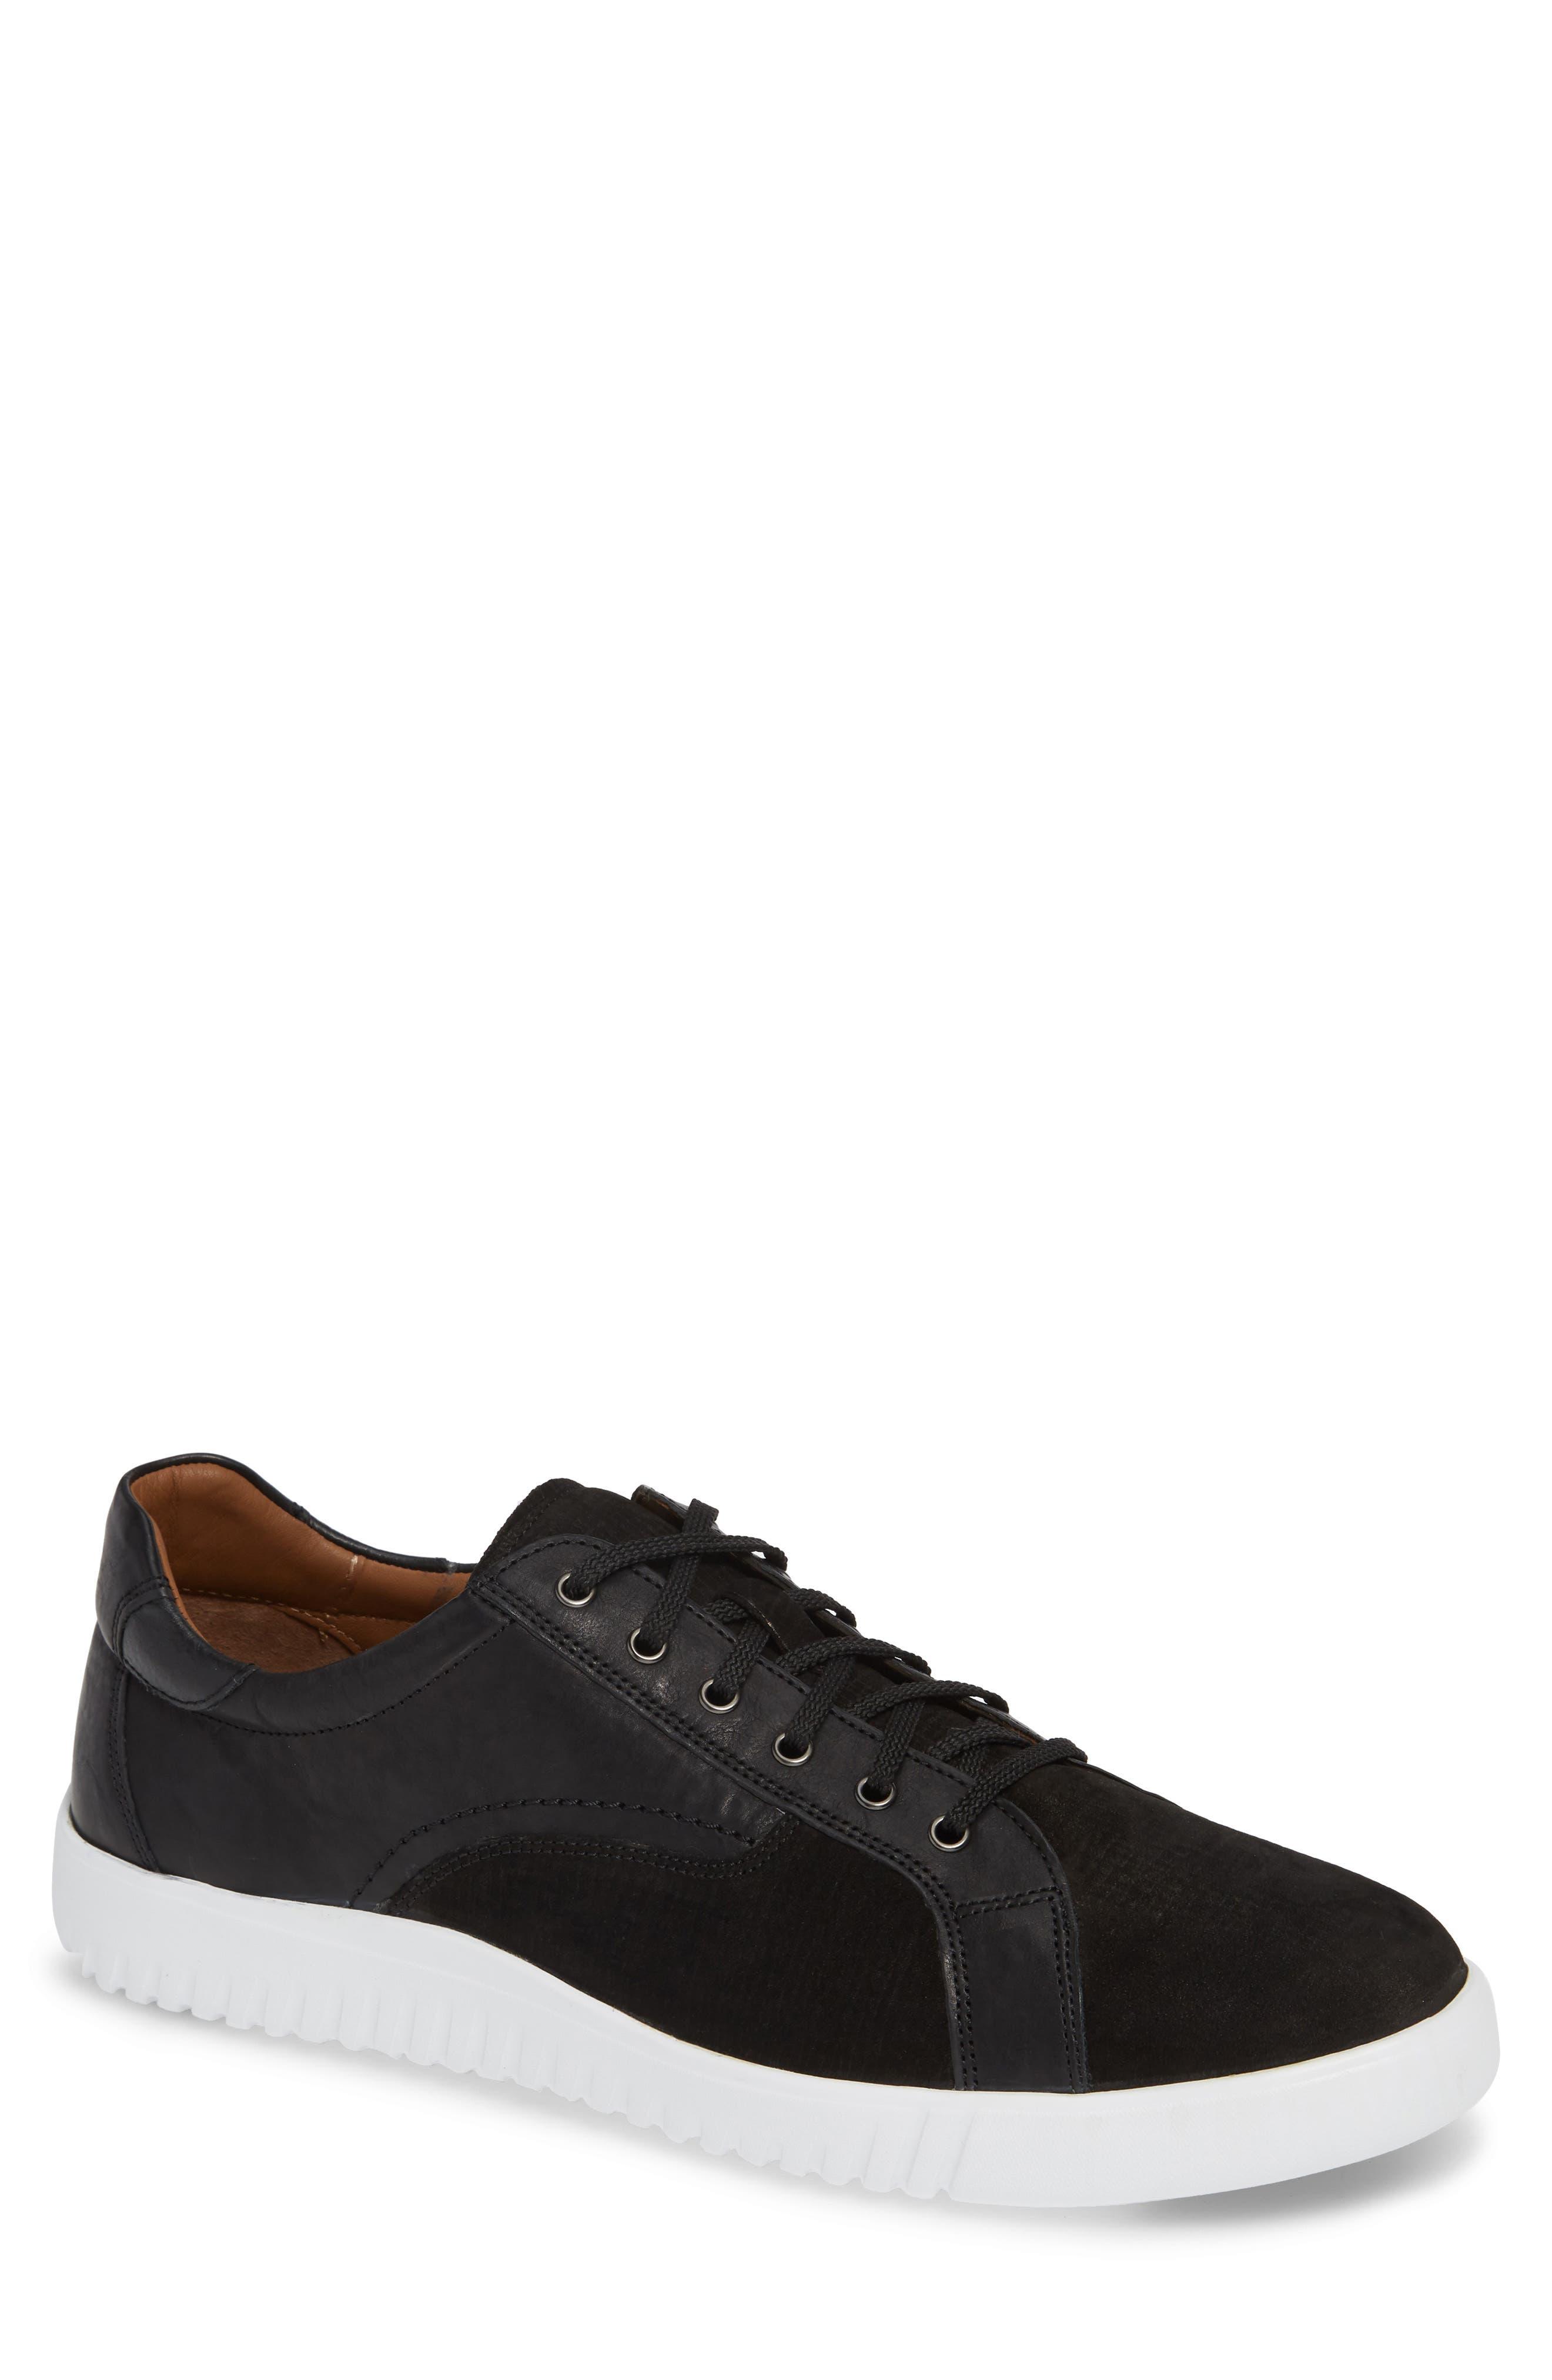 Johnston & Murphy Mcfarland Sneaker- Black